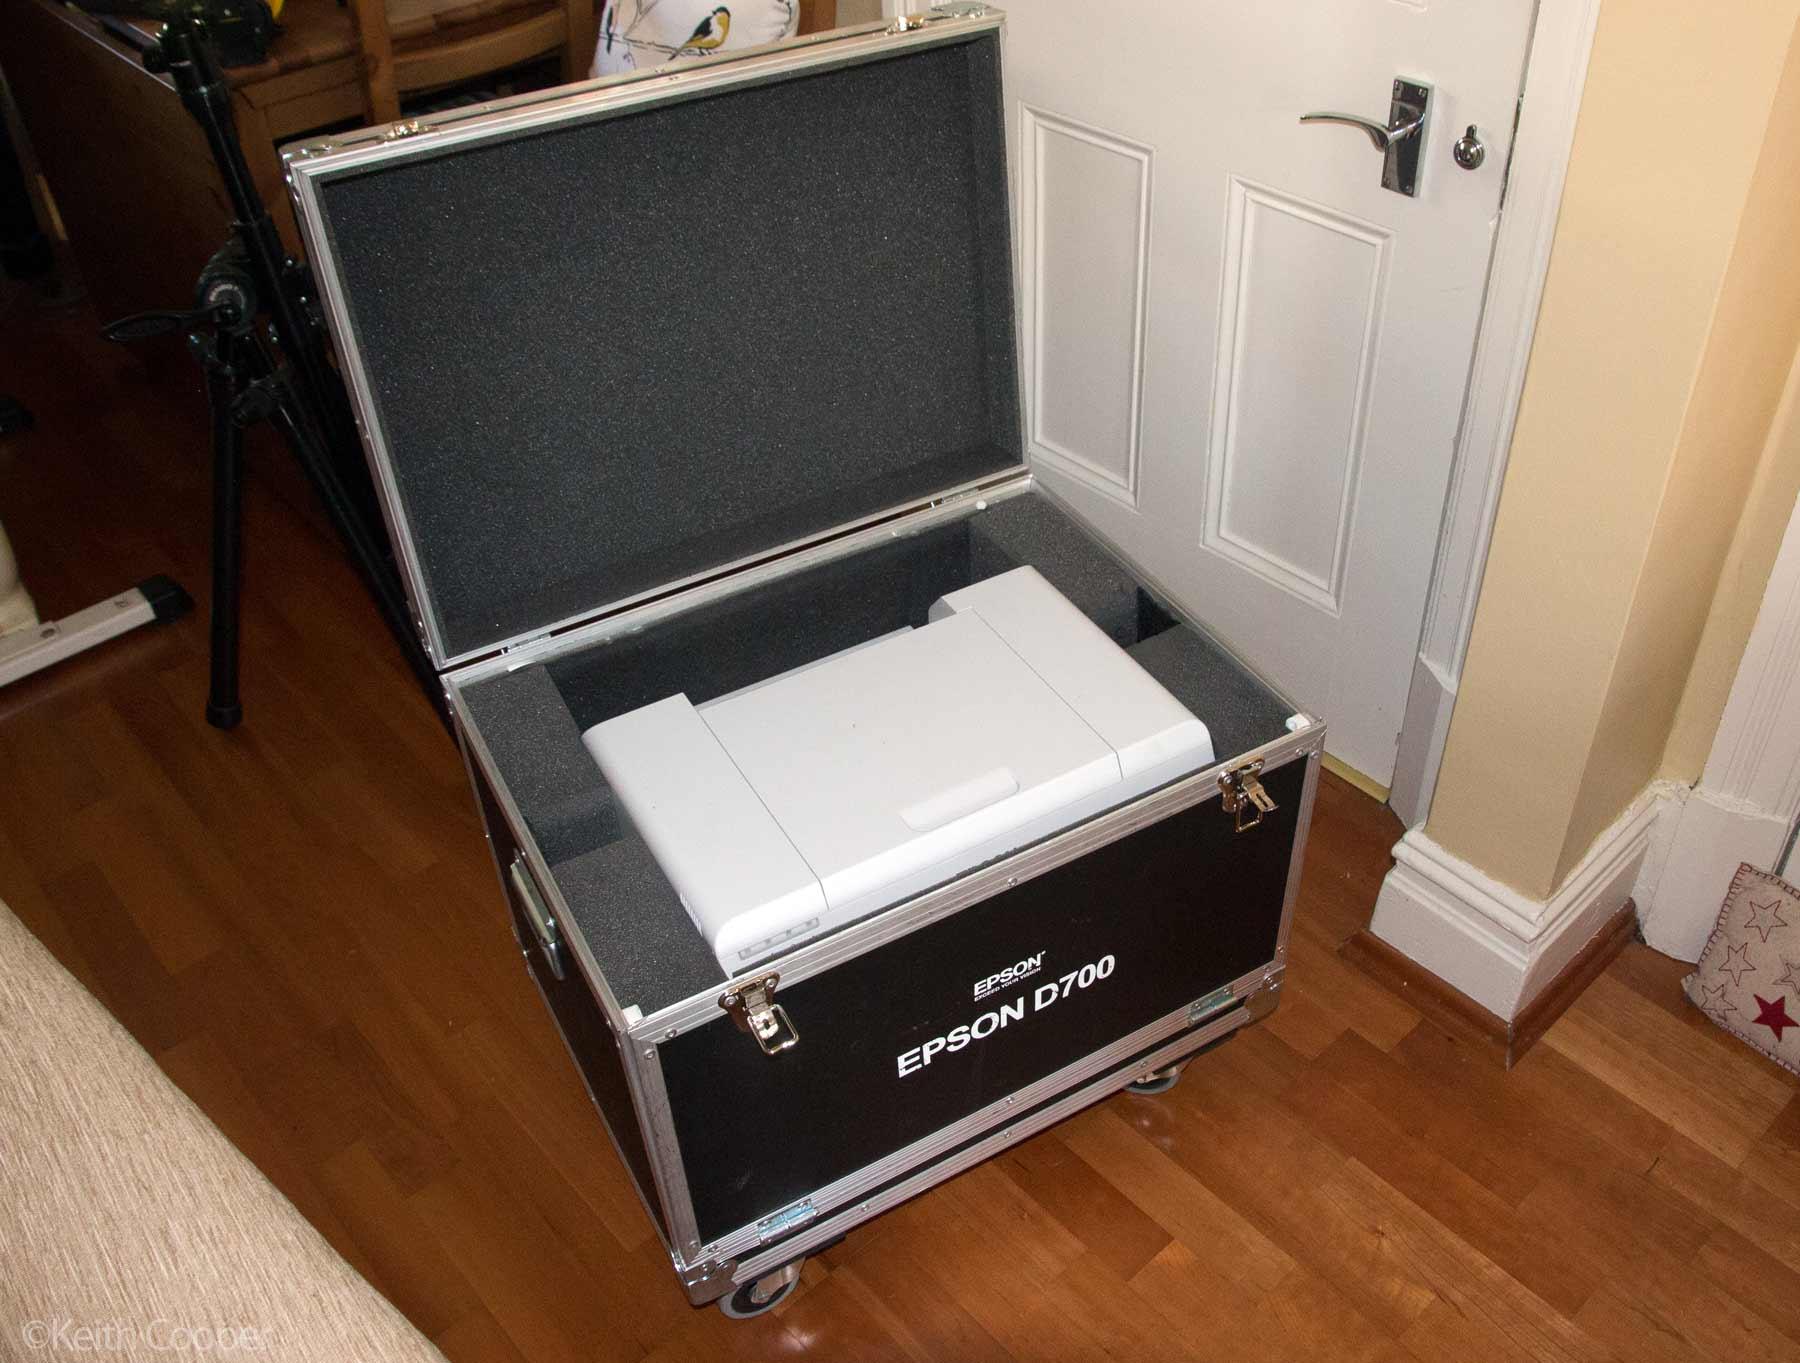 printer box